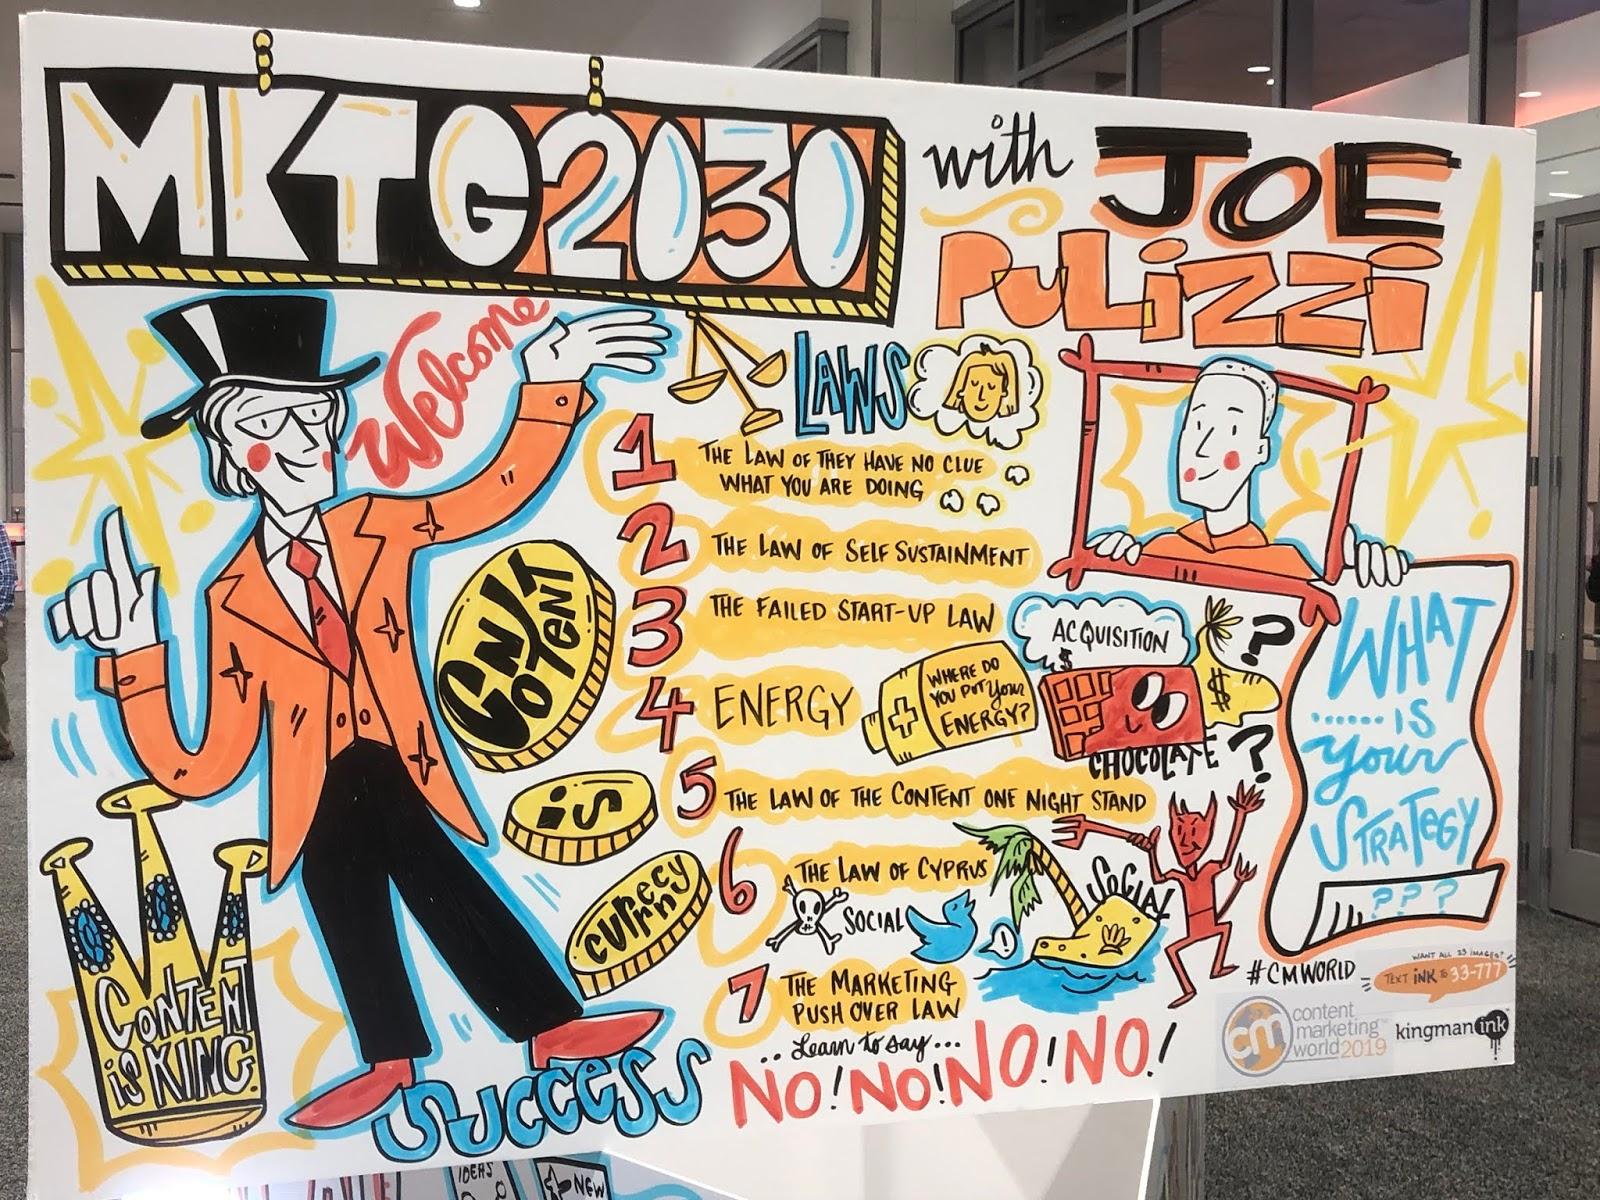 Illustration of Joe Pulizzi's Content Marketing World 2019 Presentation